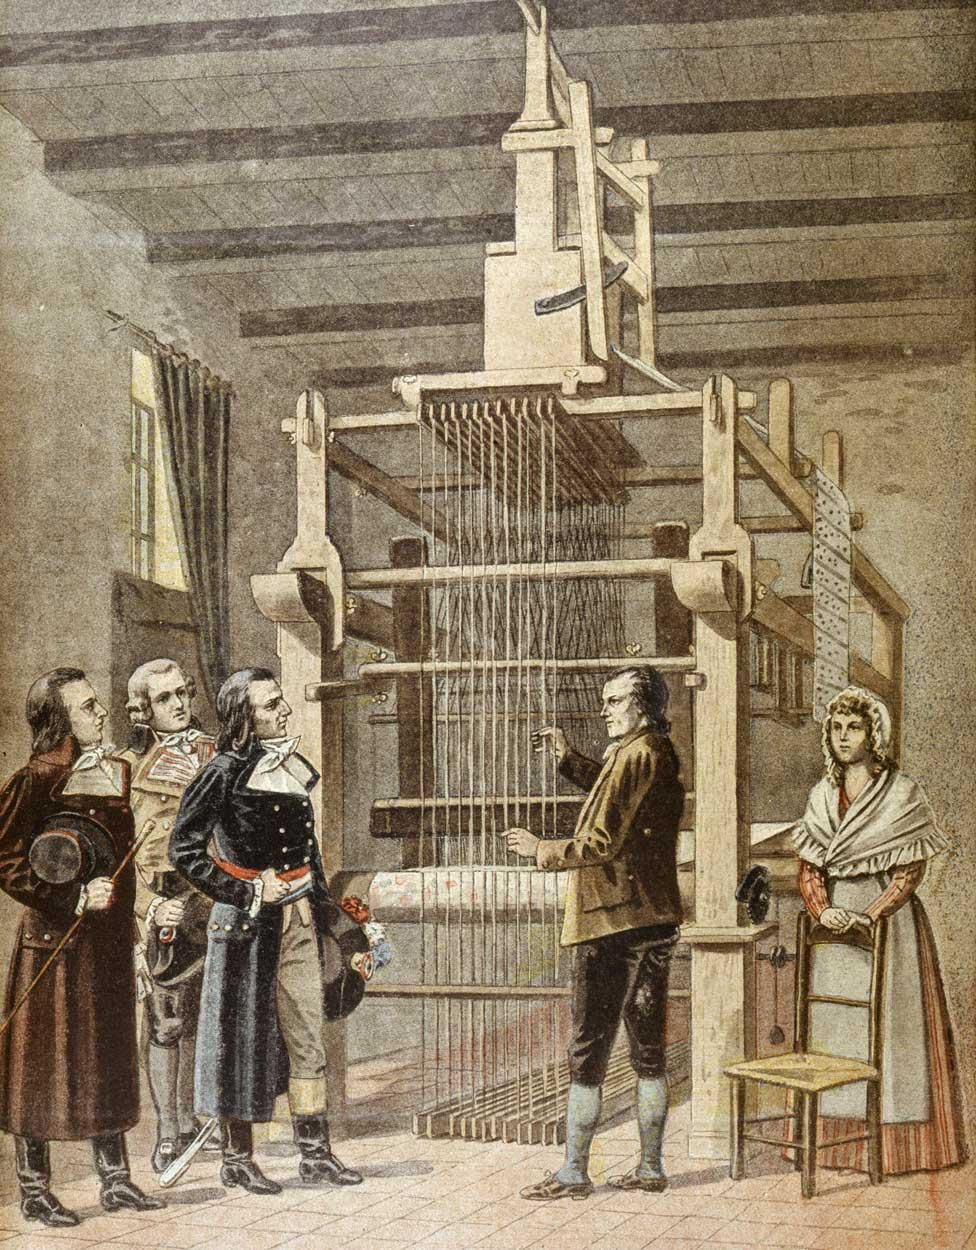 Džozef Mari Džekvard demonstrira svoju mašinu